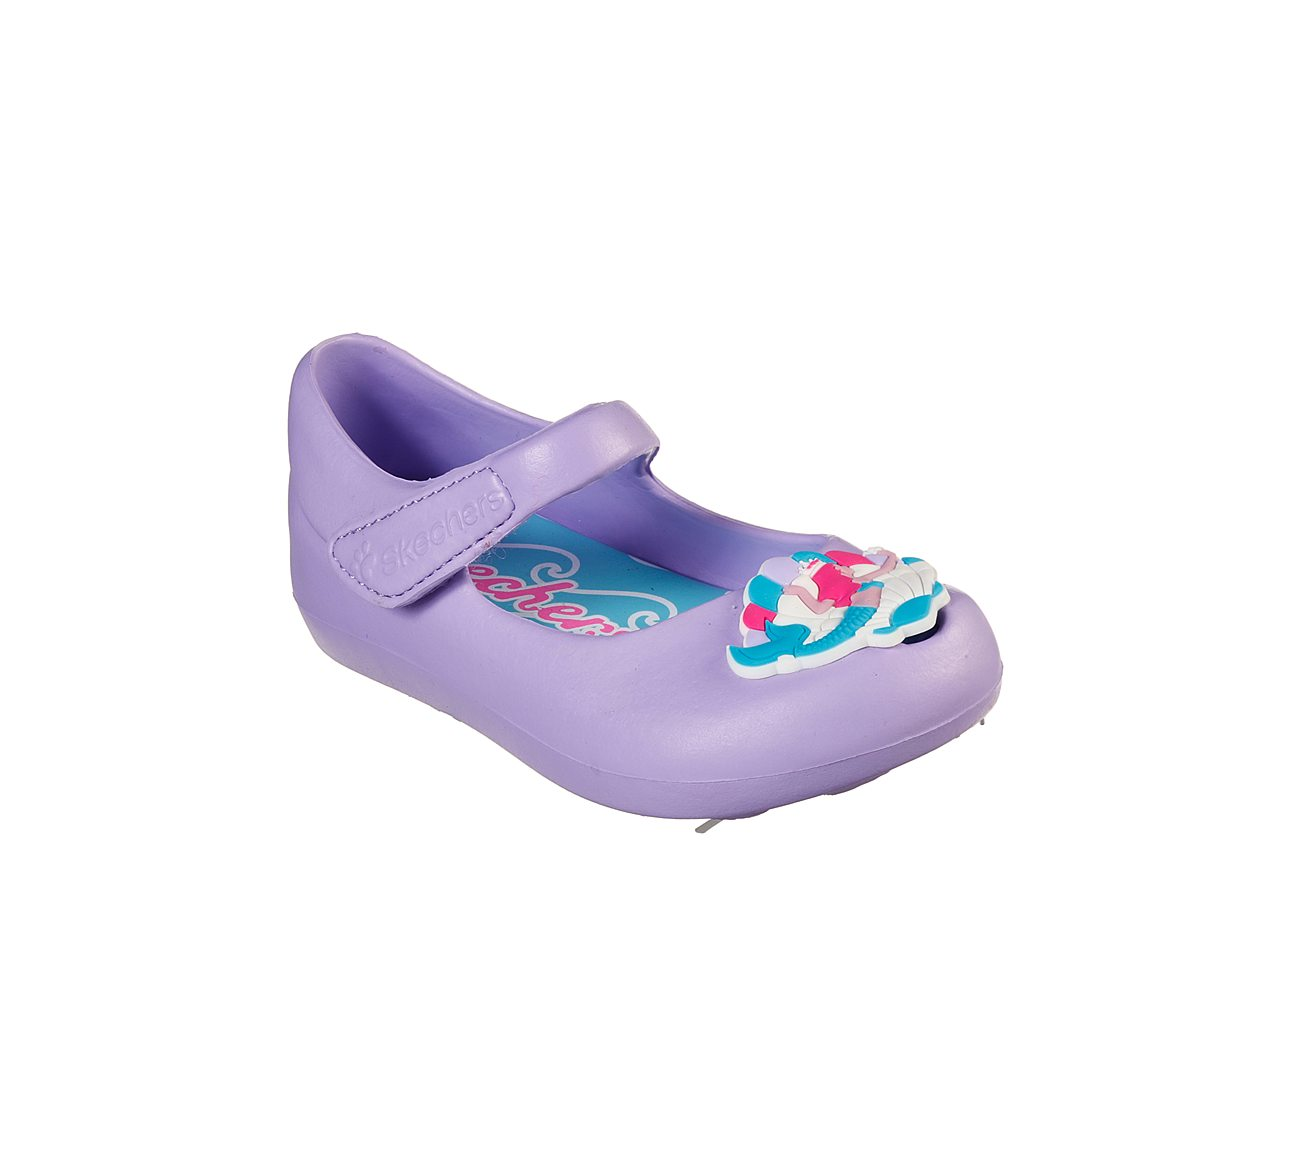 Paw Princess - Fantasy Steps